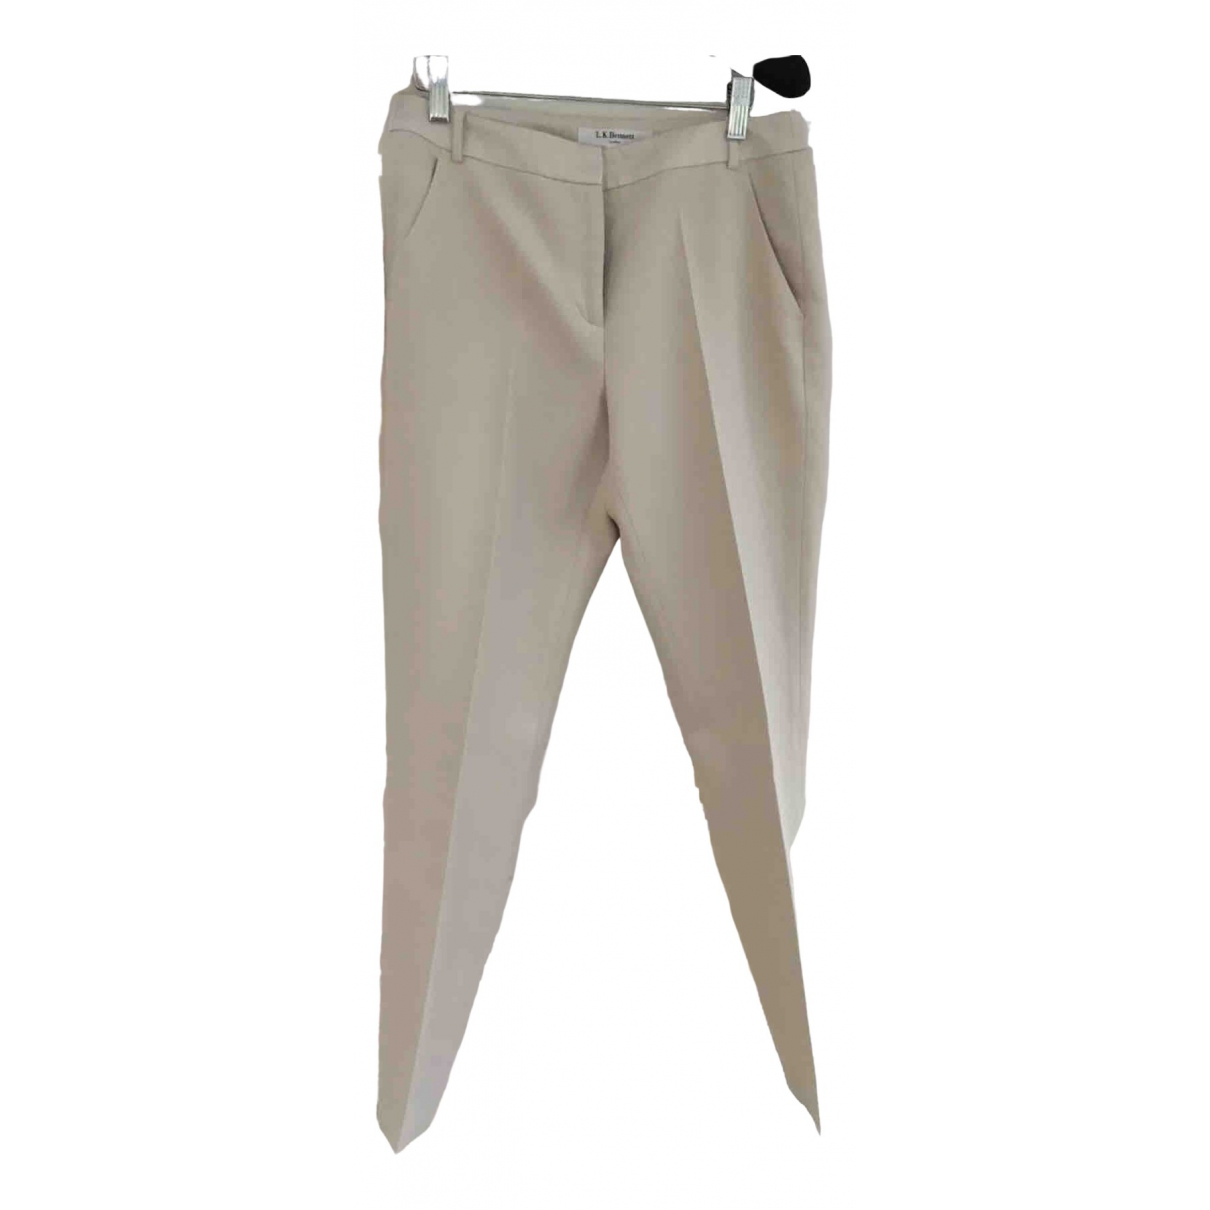 Lk Bennett N Ecru Trousers for Women 10 UK